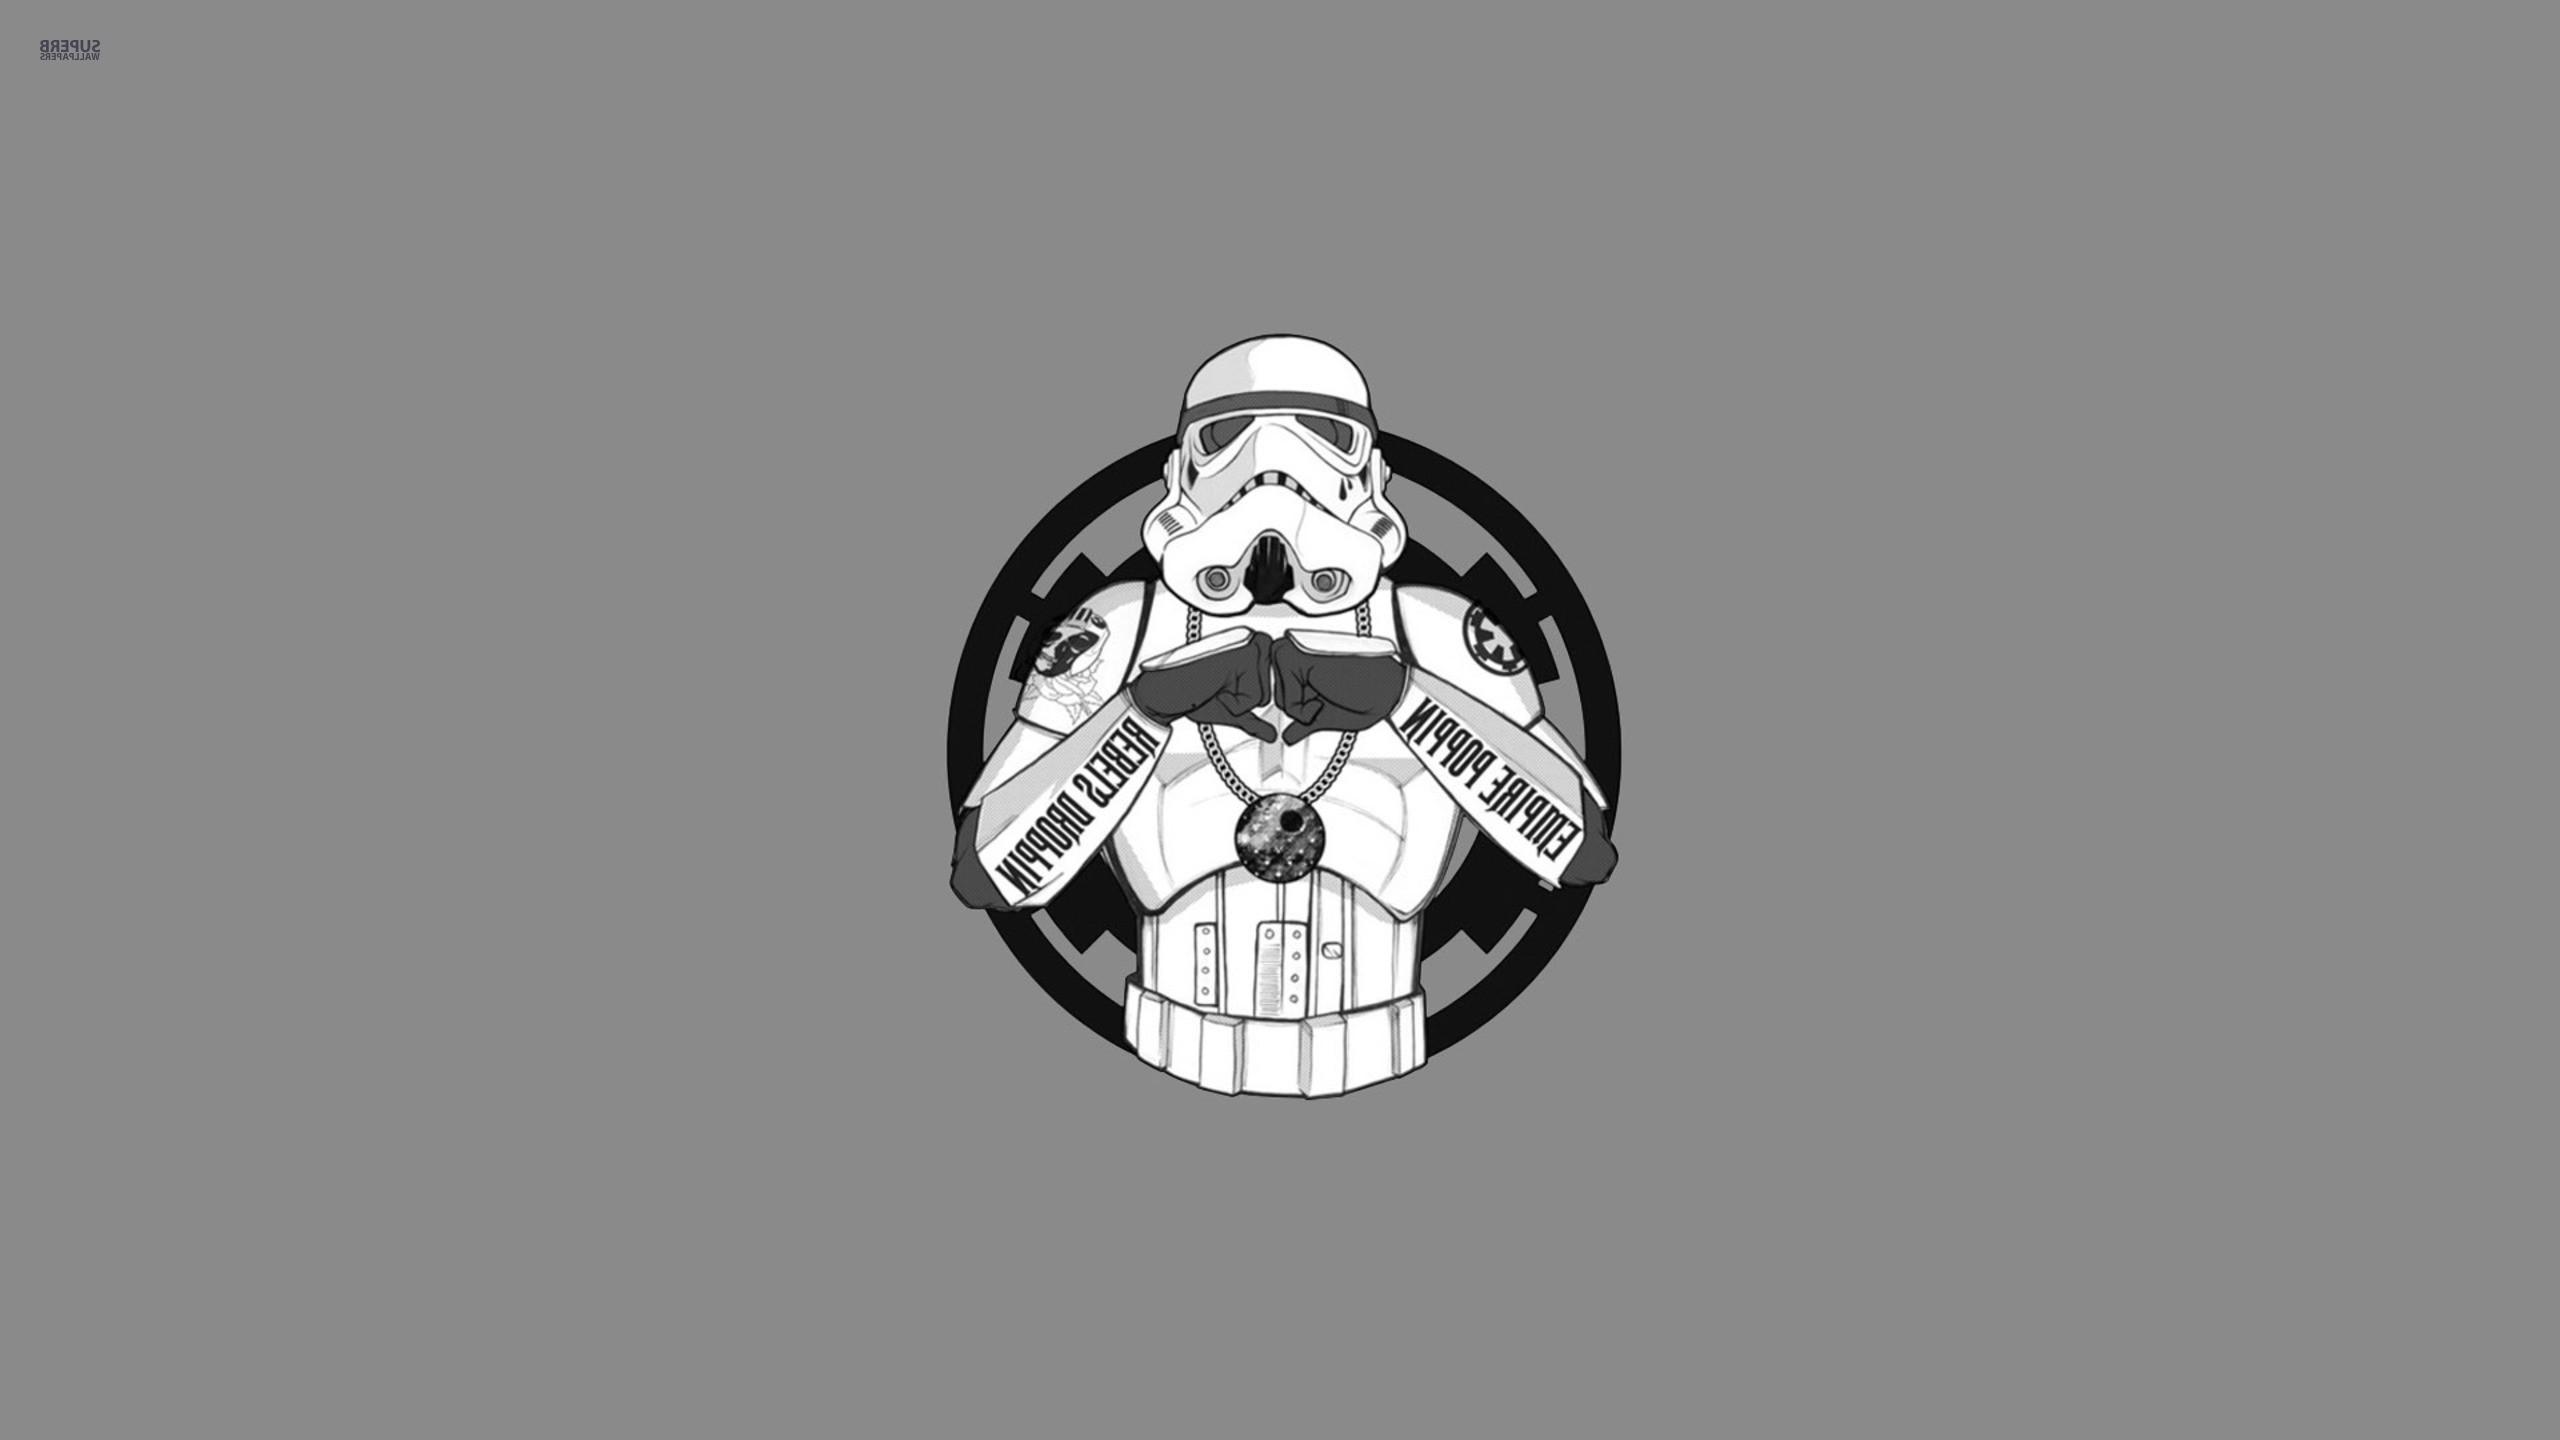 Wallpaper Illustration Star Wars Monochrome Humor Logo